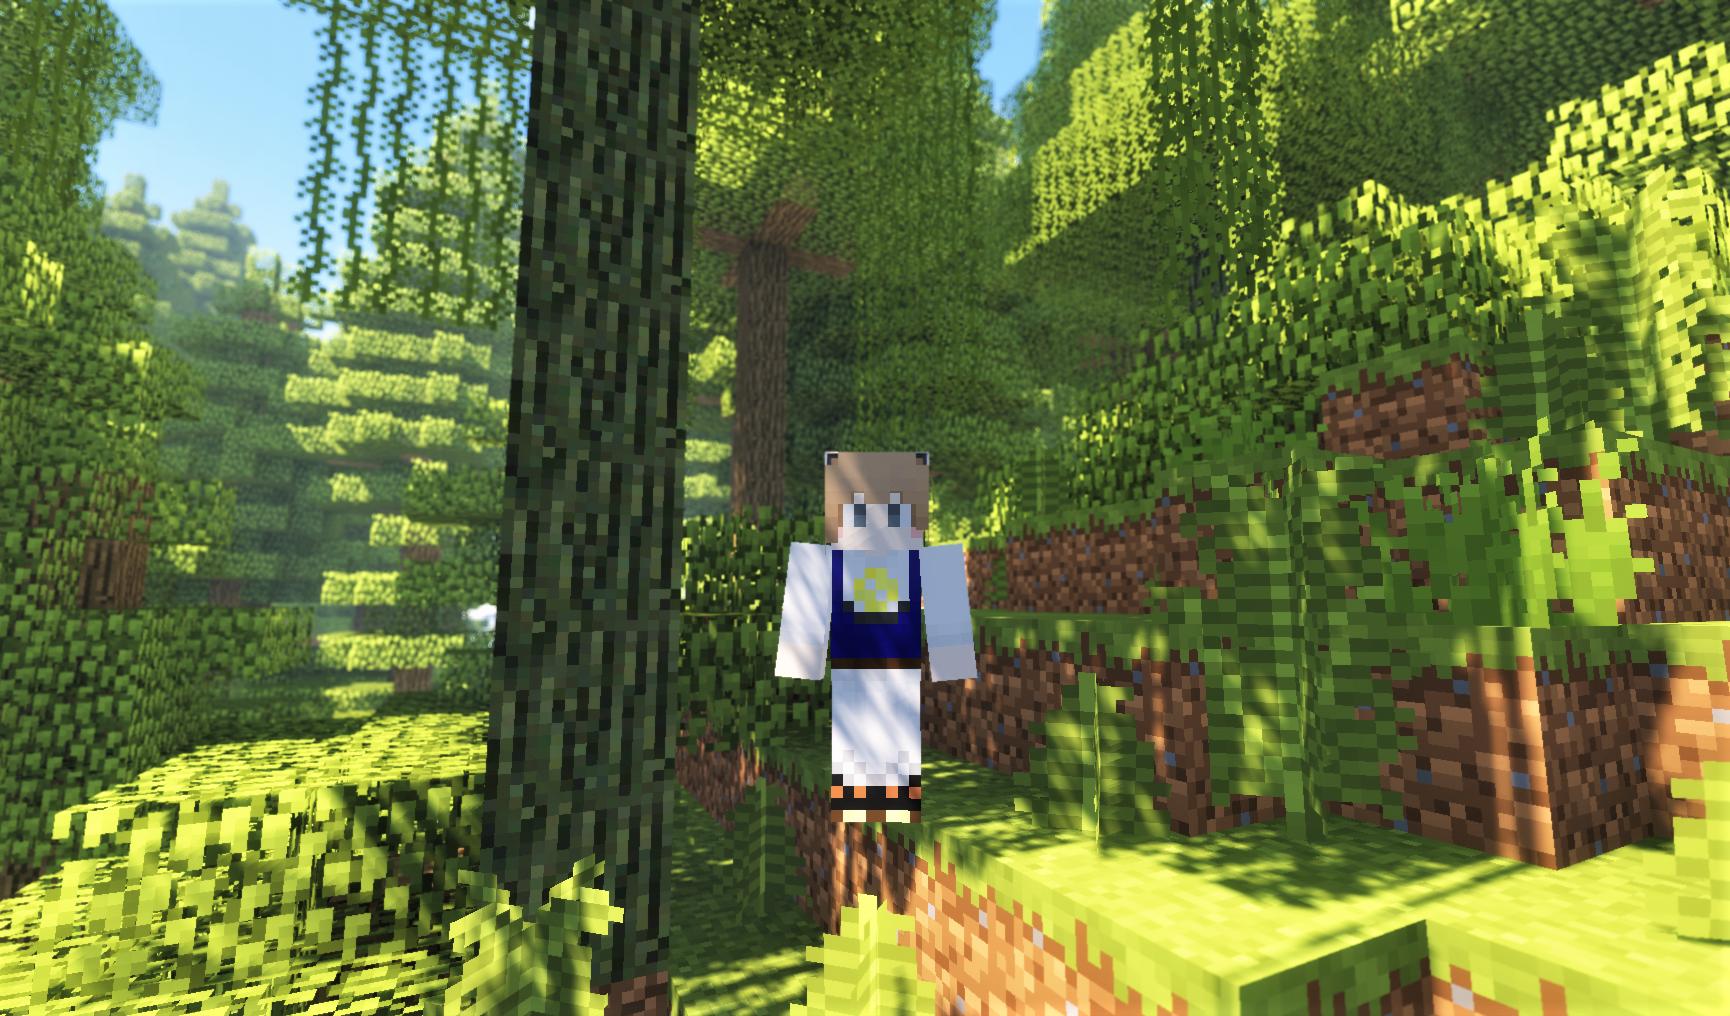 Temperate Rainforest 木がいっぱい2.png